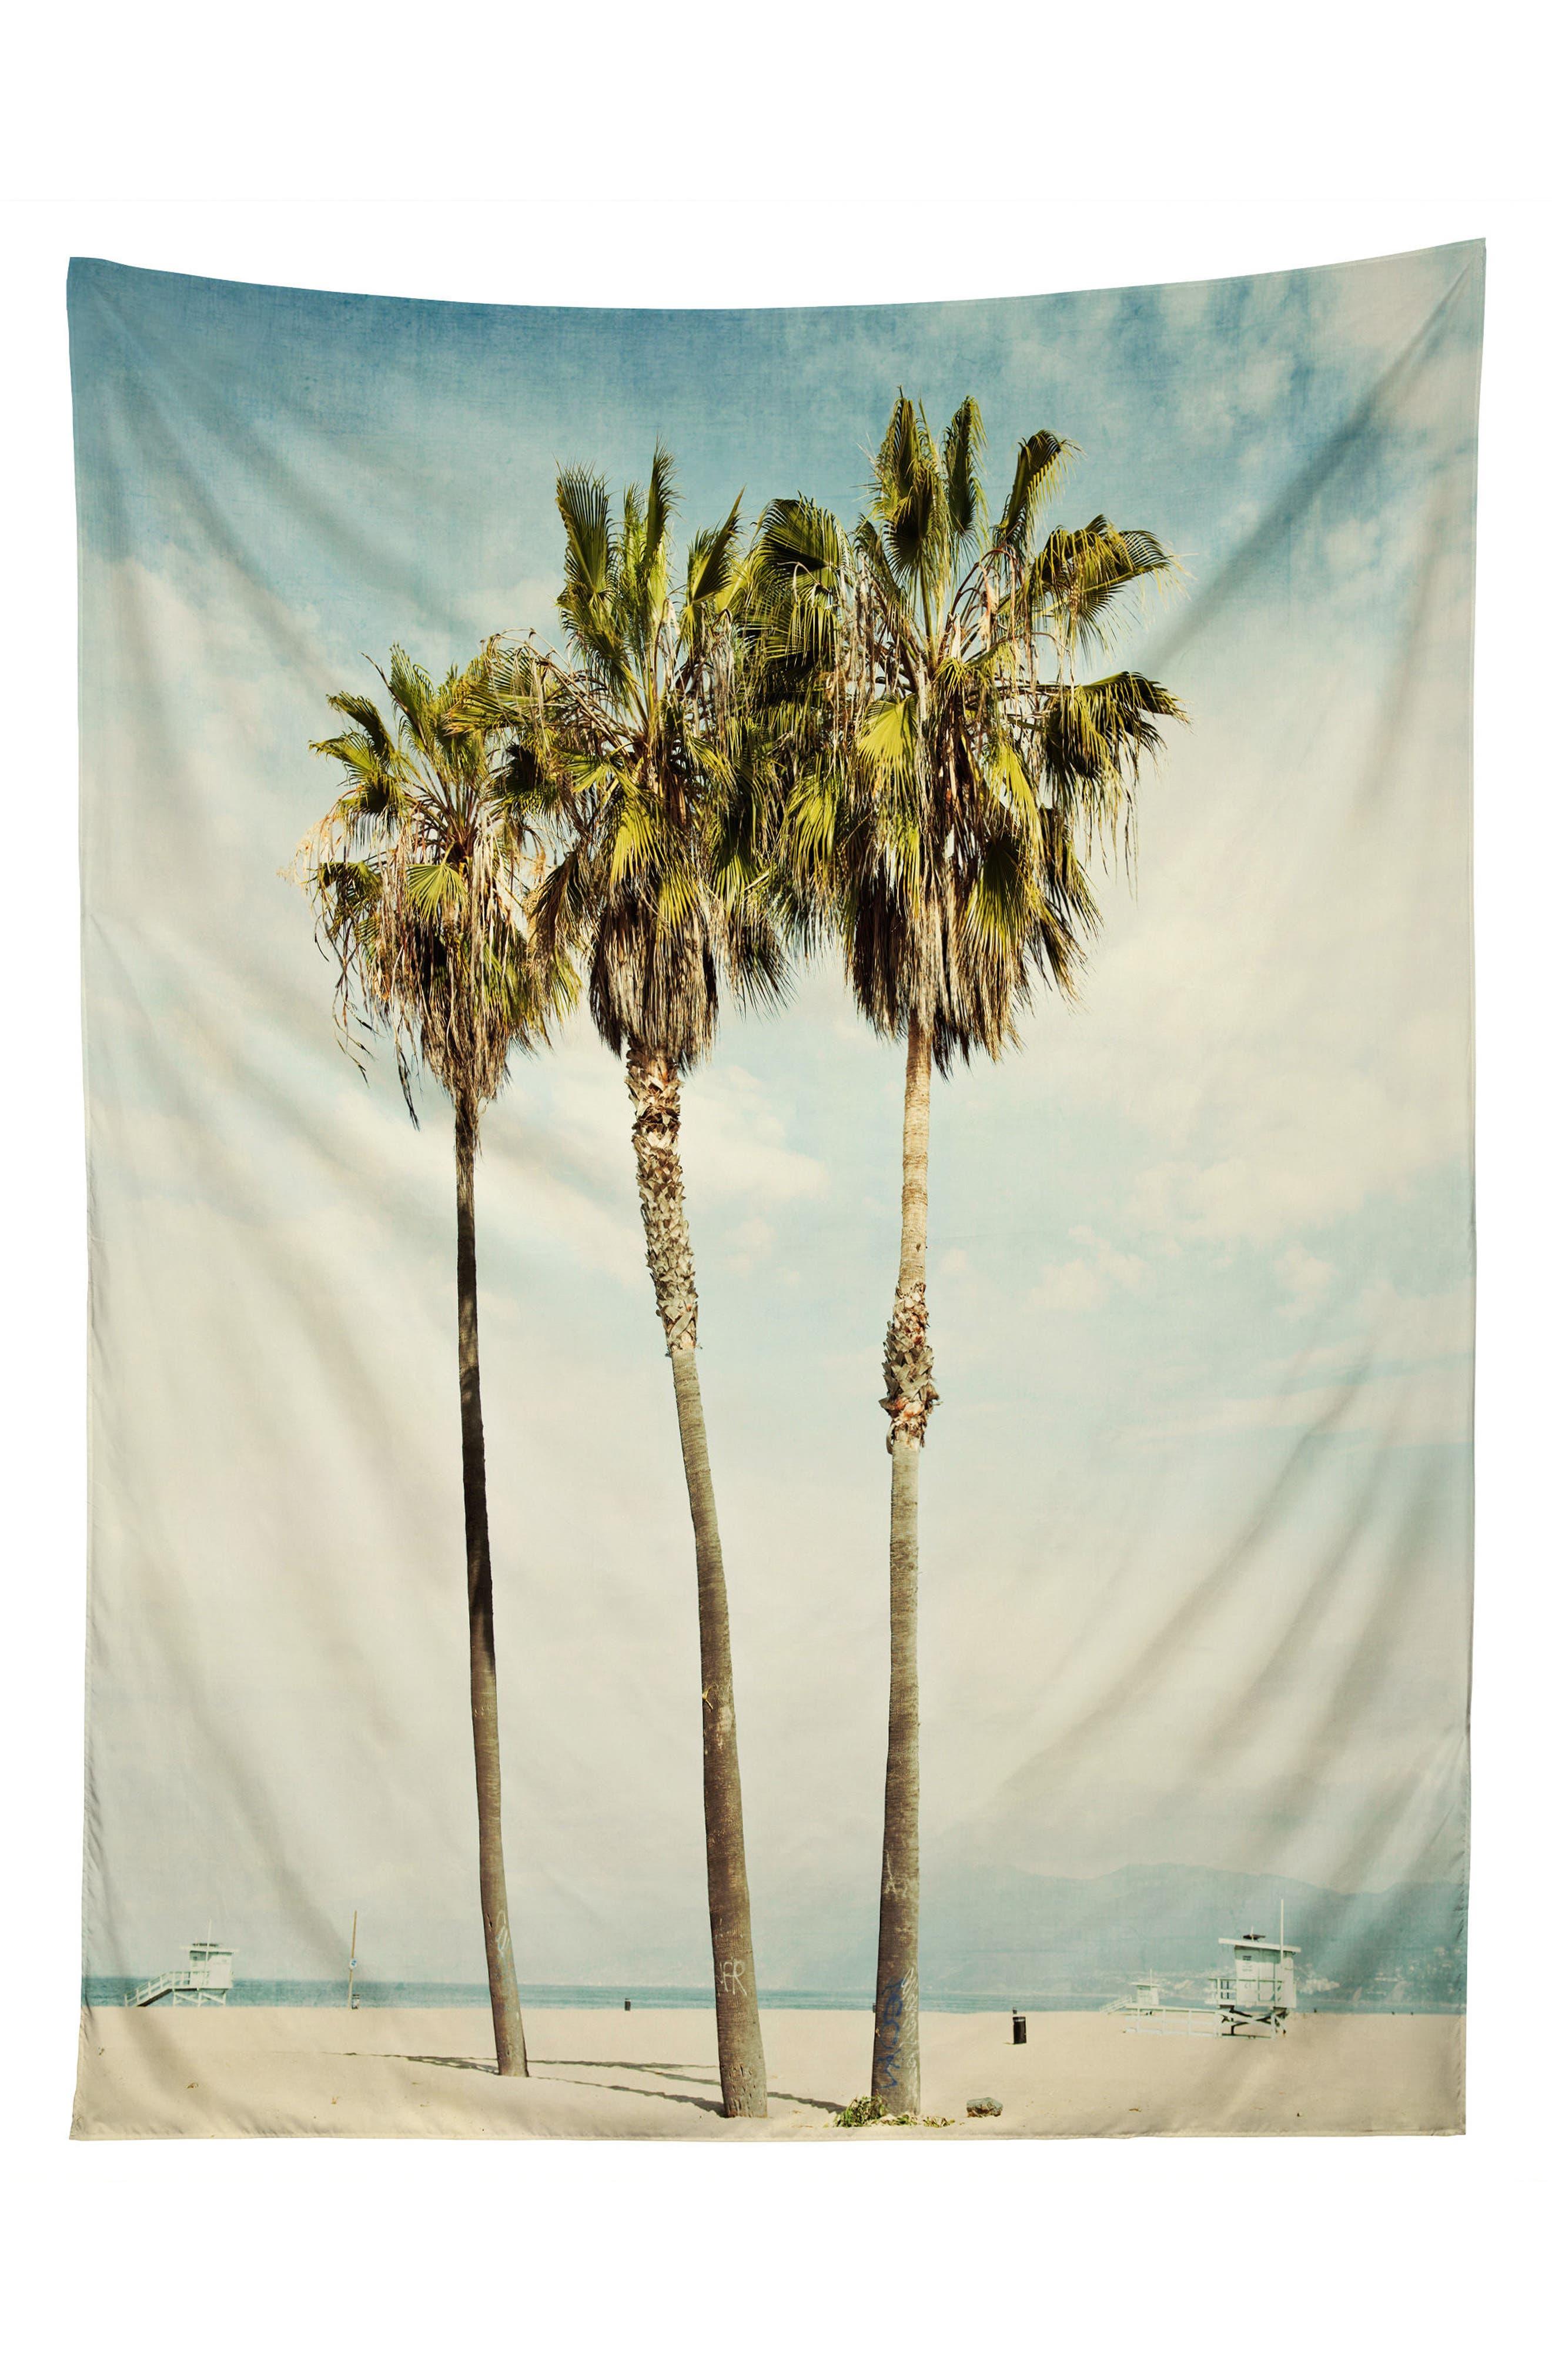 Alternate Image 1 Selected - DENY Designs Venice Beach Palms Tapestry